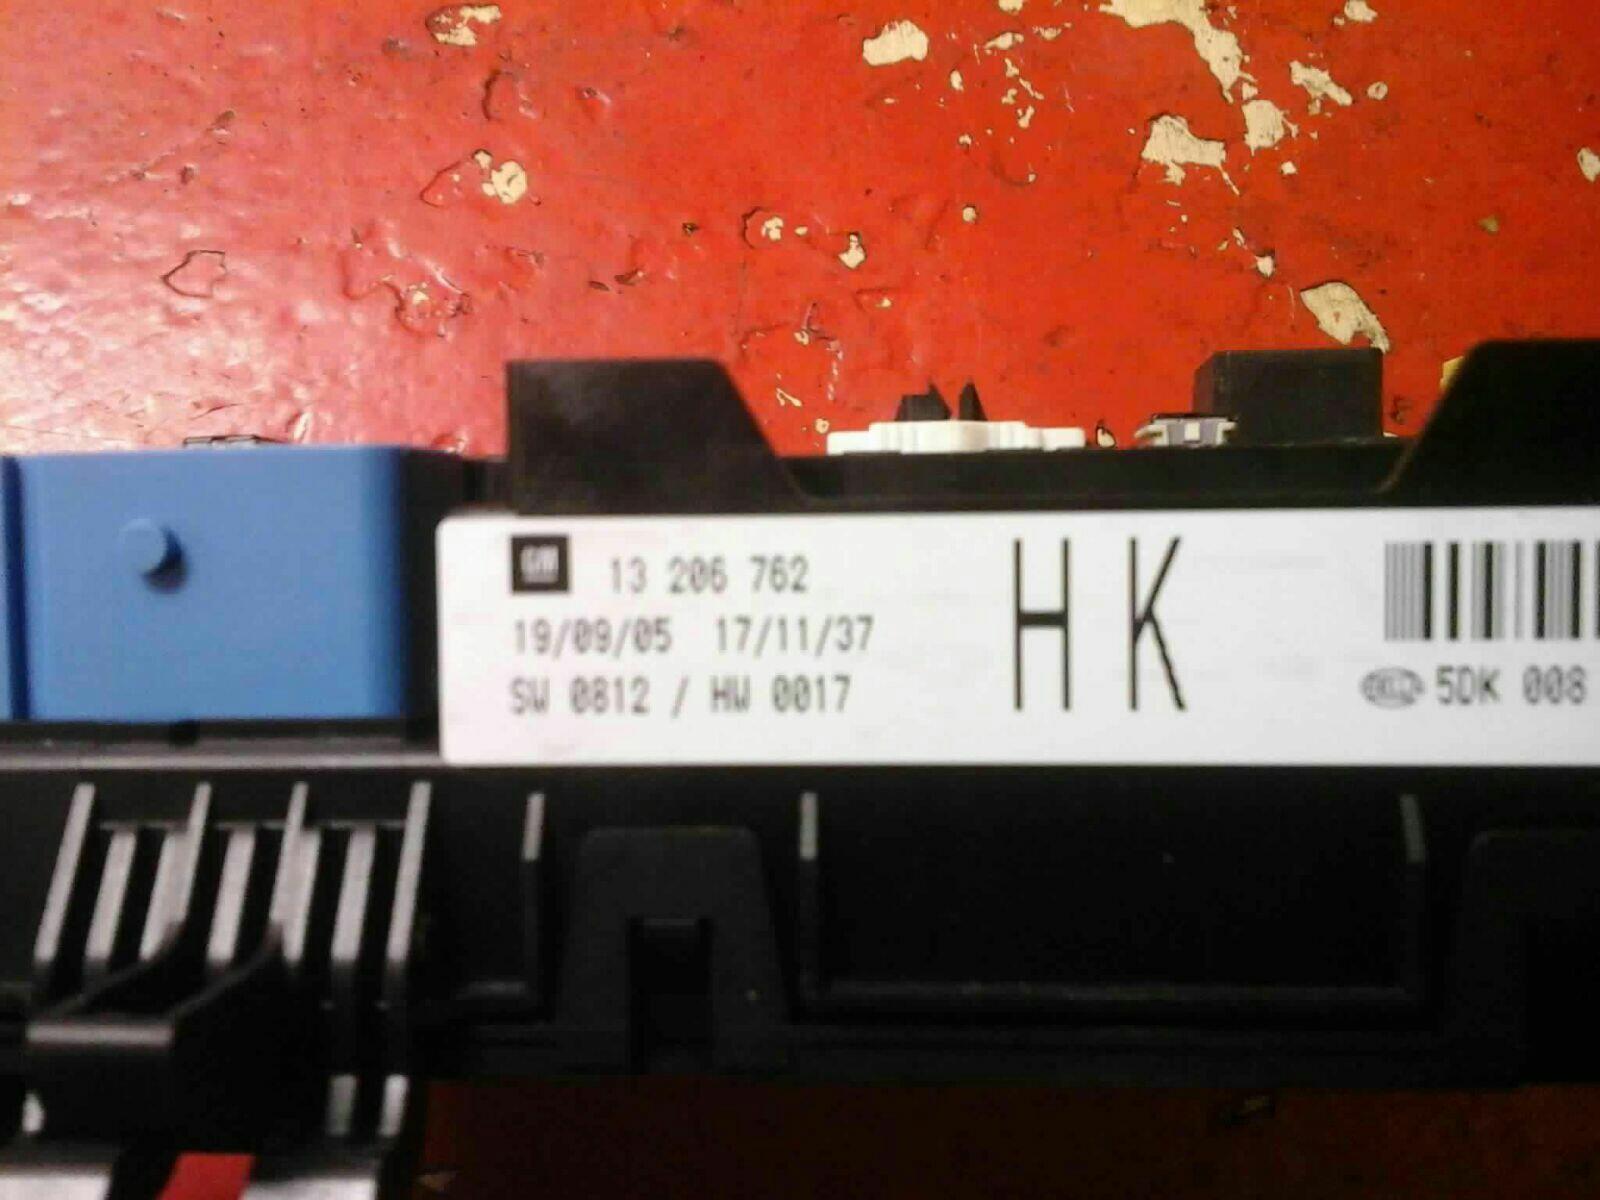 VAUXHALL ASTRA MK5 H + ZAFIRA B REAR ELECTRIC CONTROL REC FUSE BOX HK  2004-10